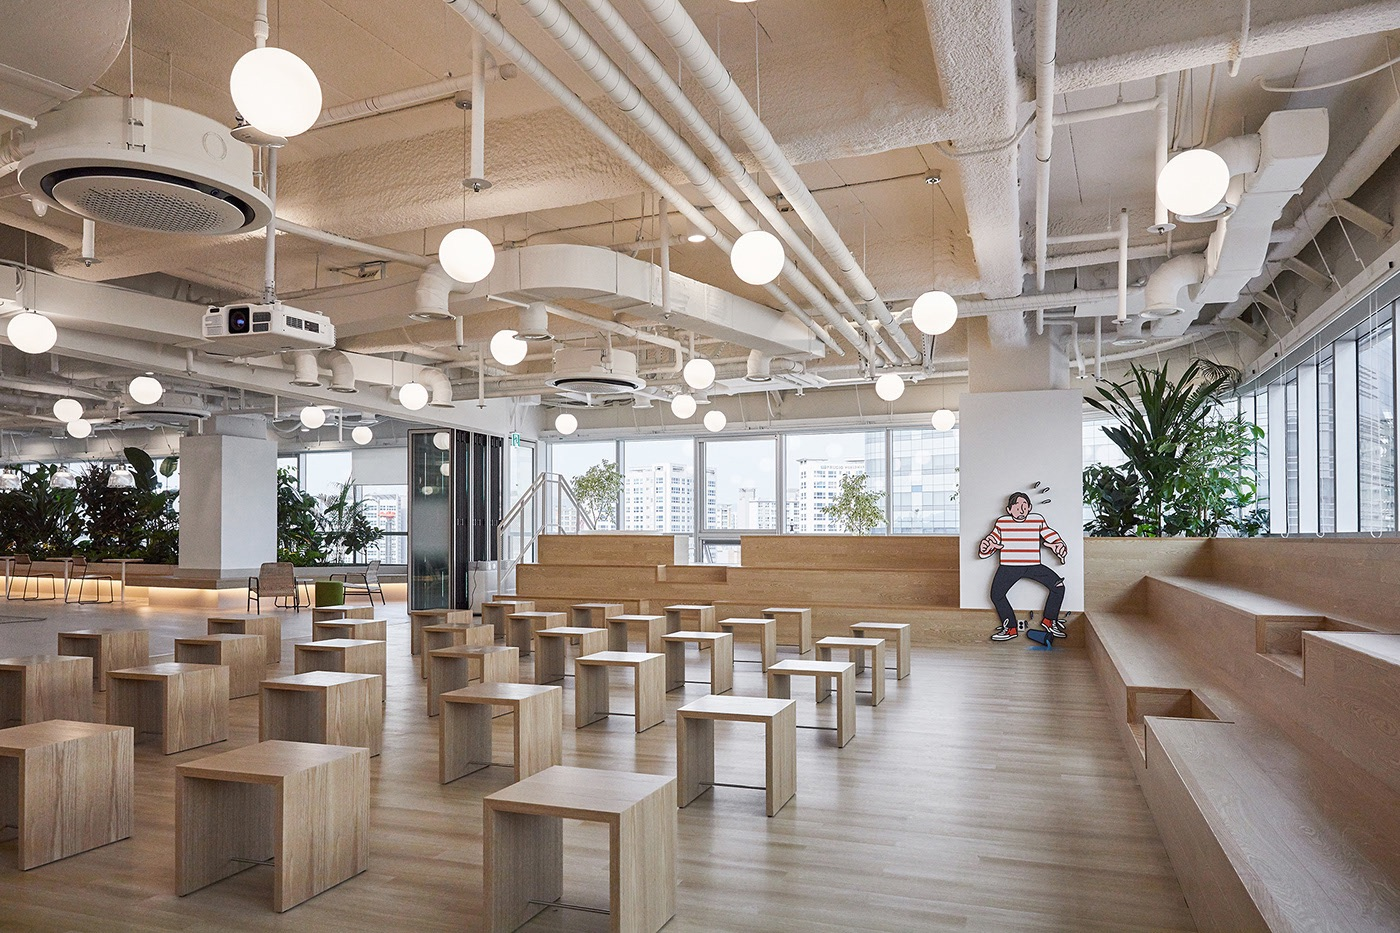 kakao-pay-office-3